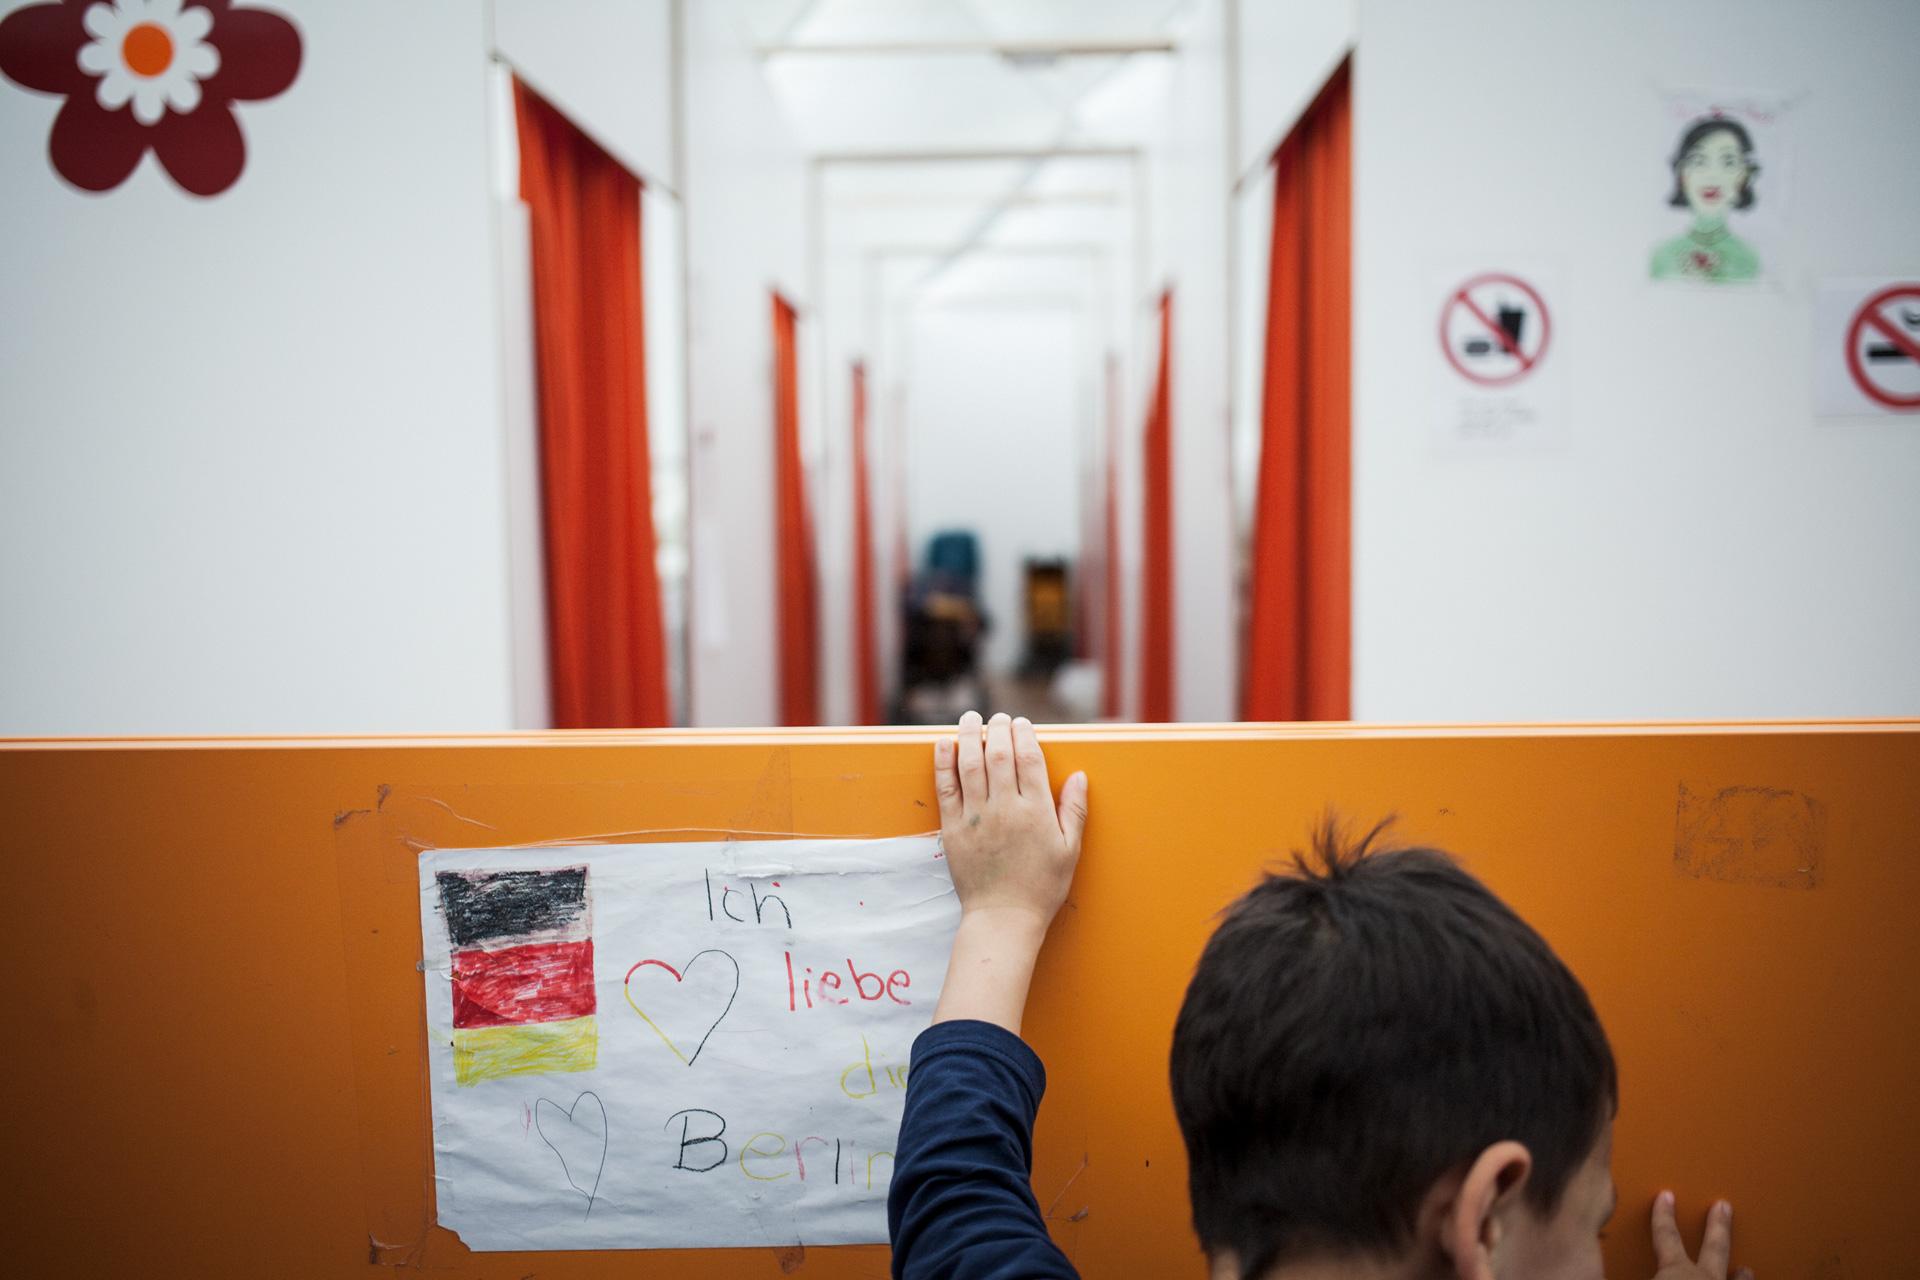 timo-stammberger-photography-fluechtlinge-refugees-berlin-migration-notunterkunft_12